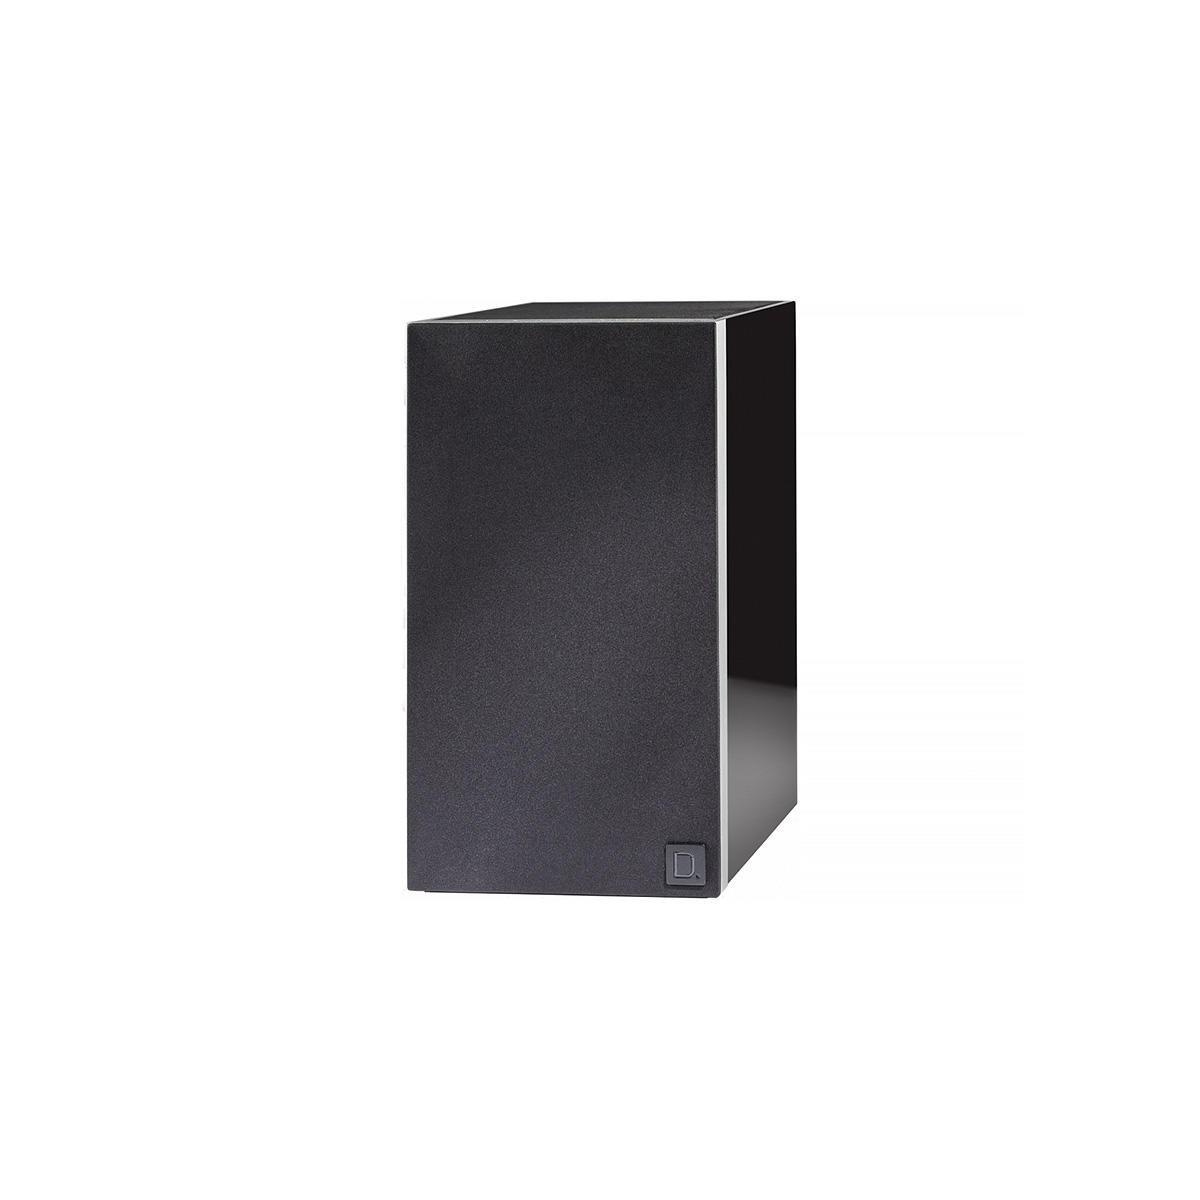 Kompaktlautsprecher DEMAND 9 (Paarpreis)